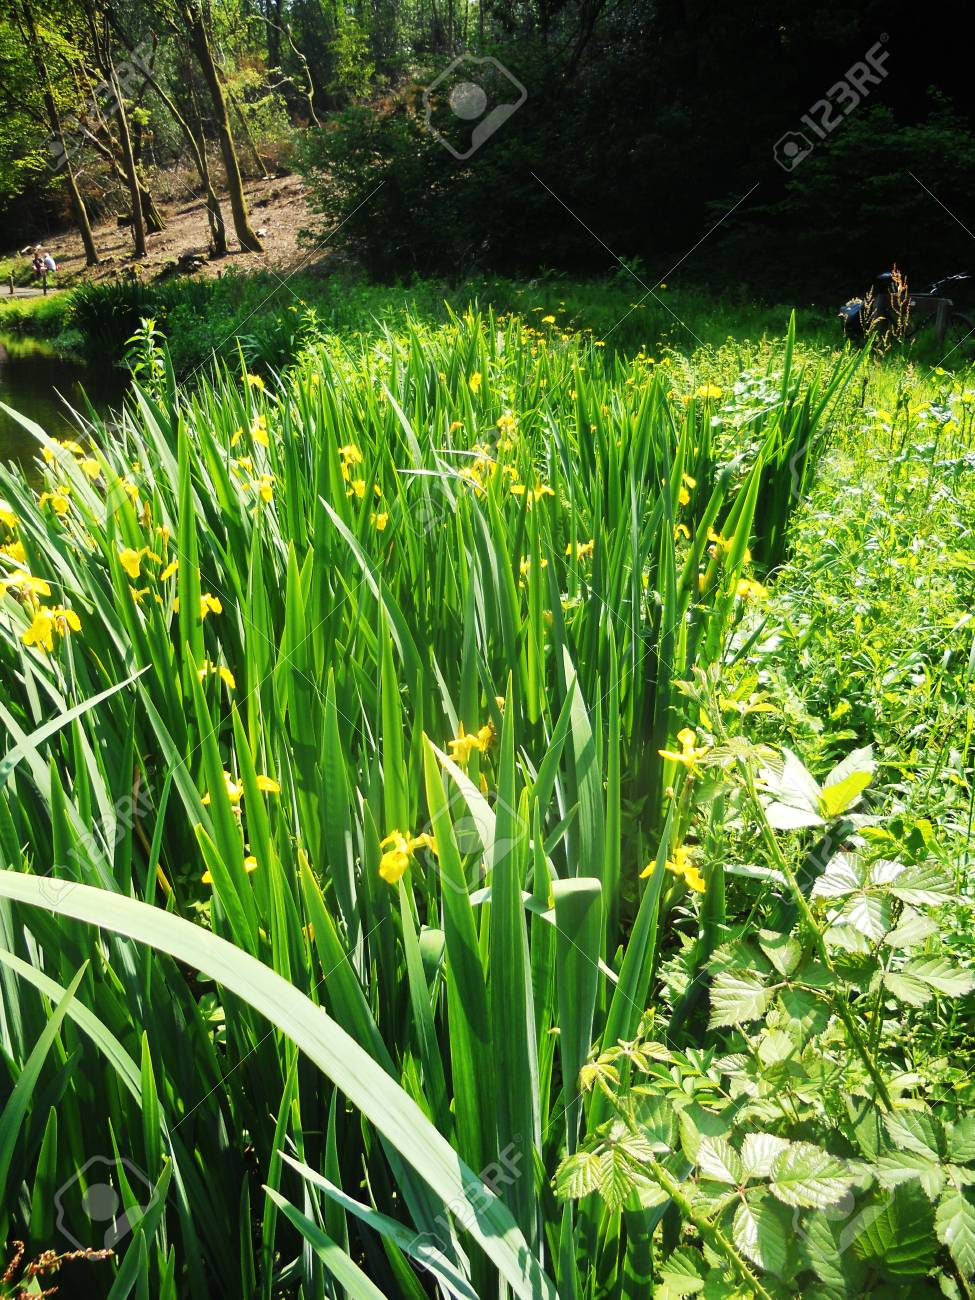 Yellow Irises Growing Near A Pond Surrey Uk Stock Photo Picture